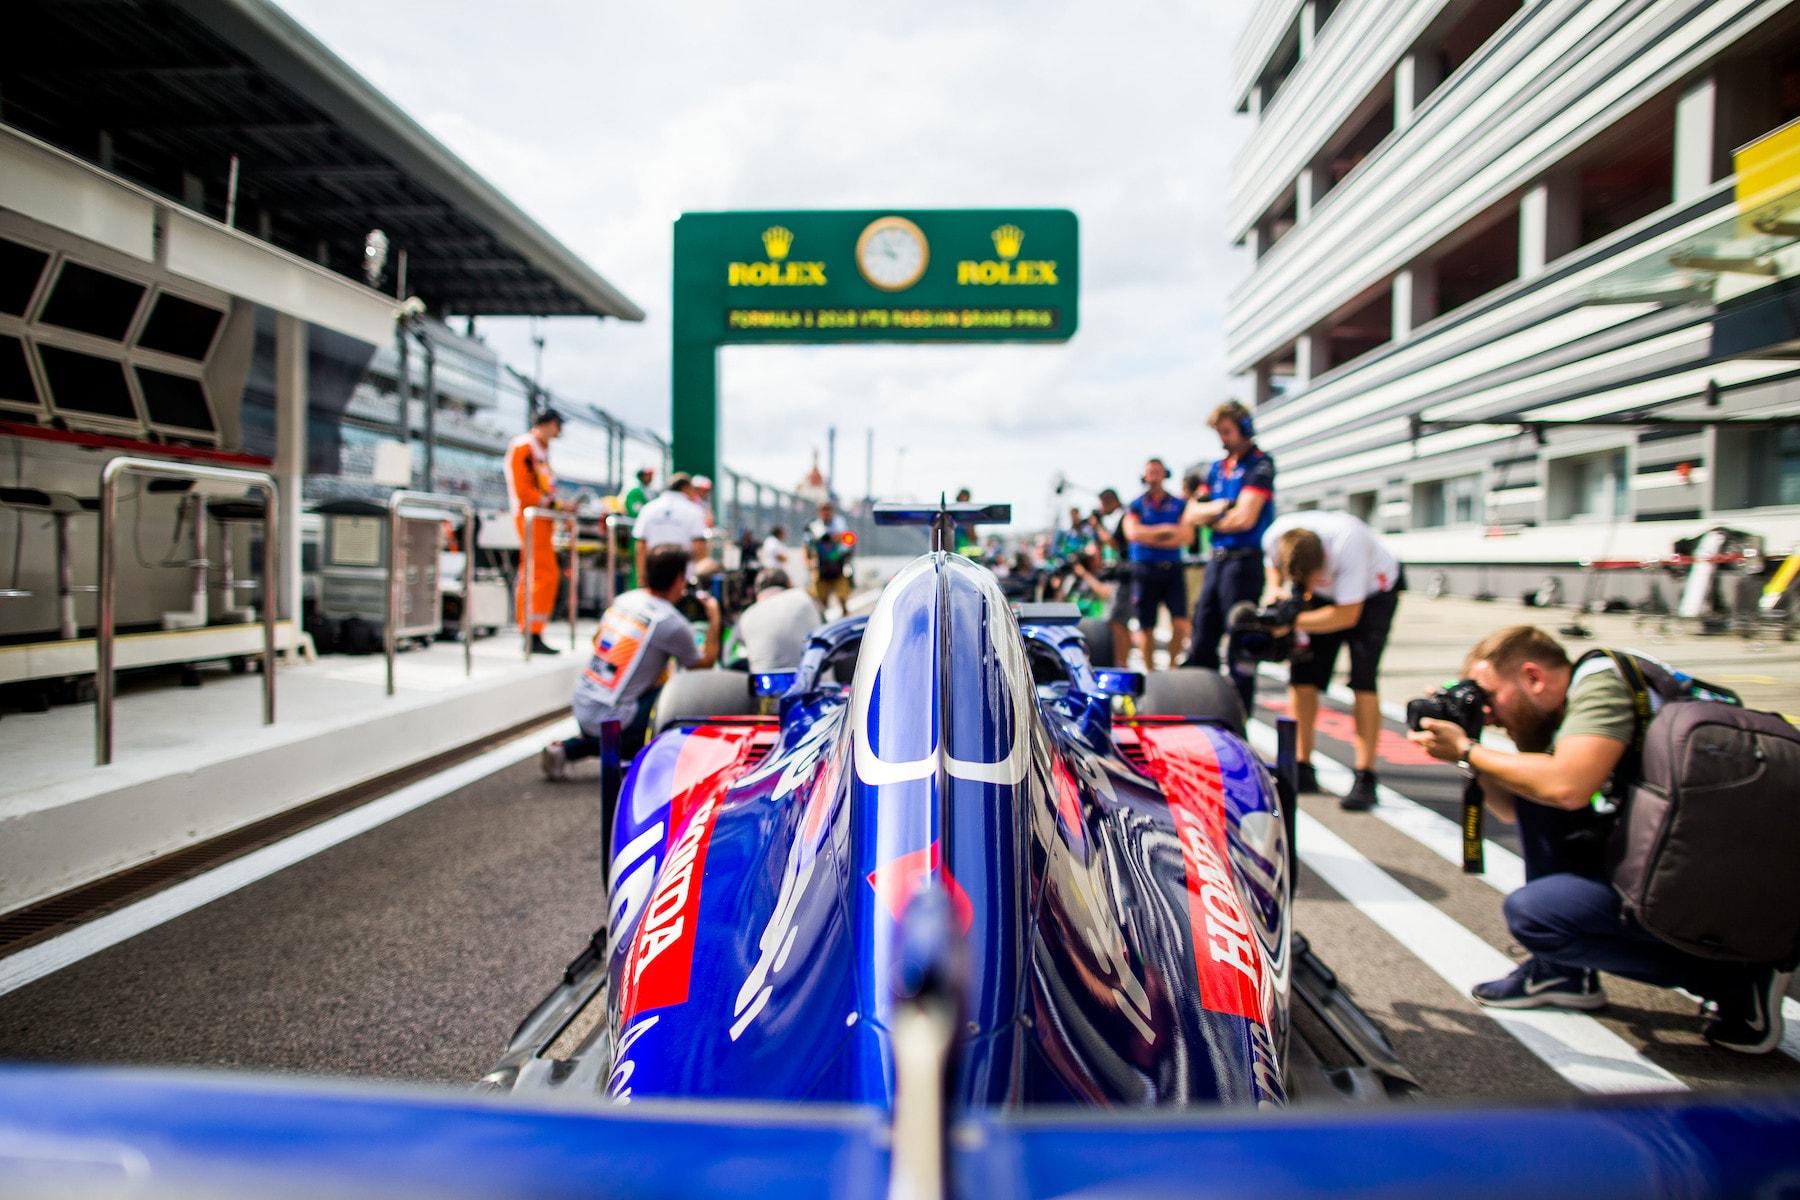 2018 Brendon Hartley | Toro Rosso STR13 | 2018 Russain GP FP1 1 Photo by Peter Fox copy.jpg